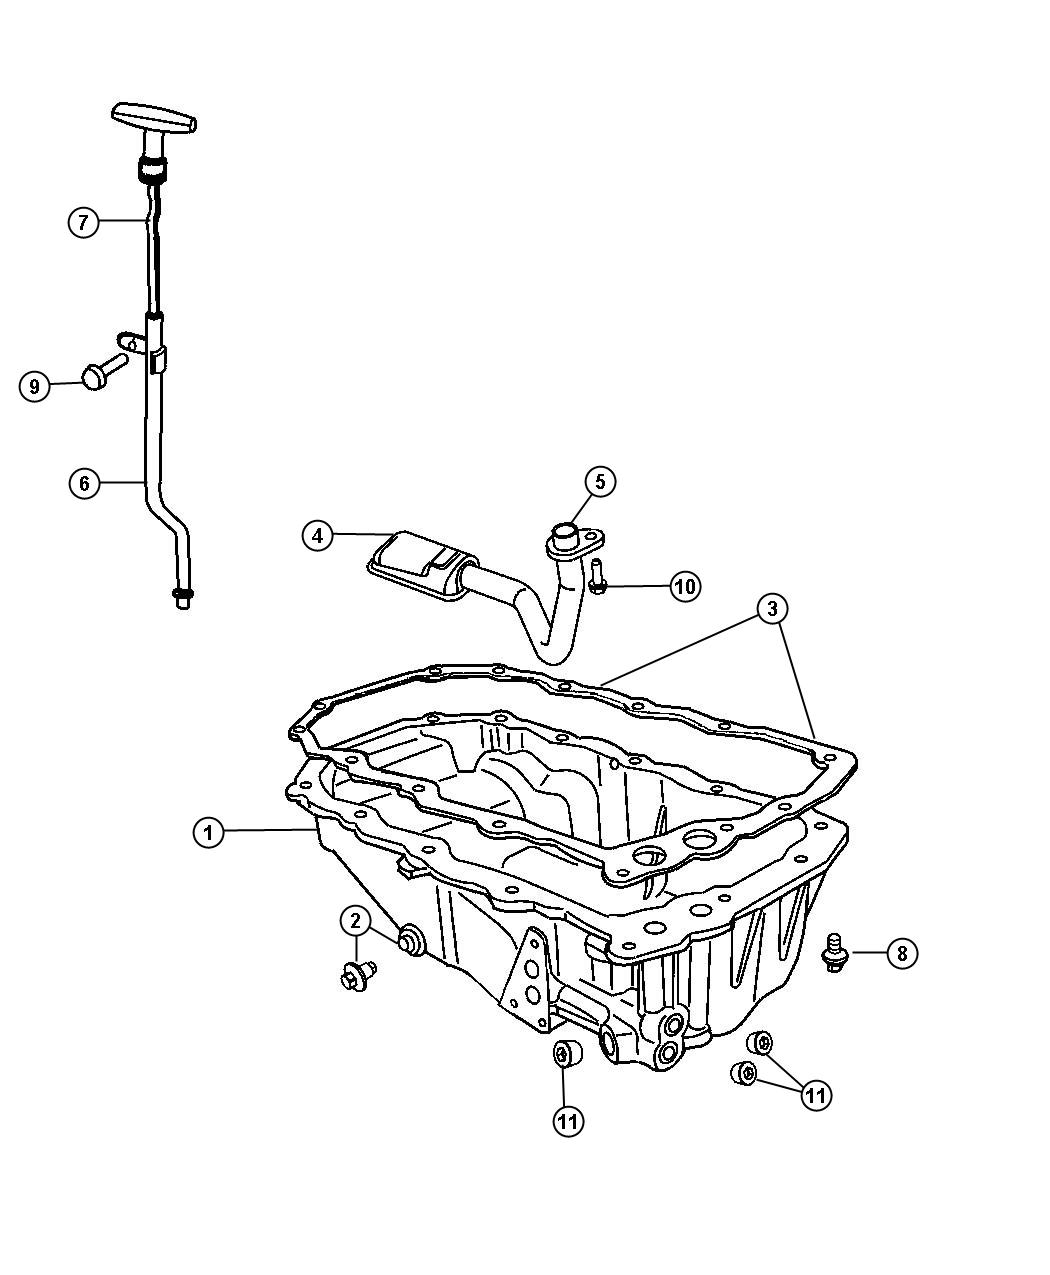 Dodge Viper Srt10 Coupe 8 4l V10 Plug Oil Drain